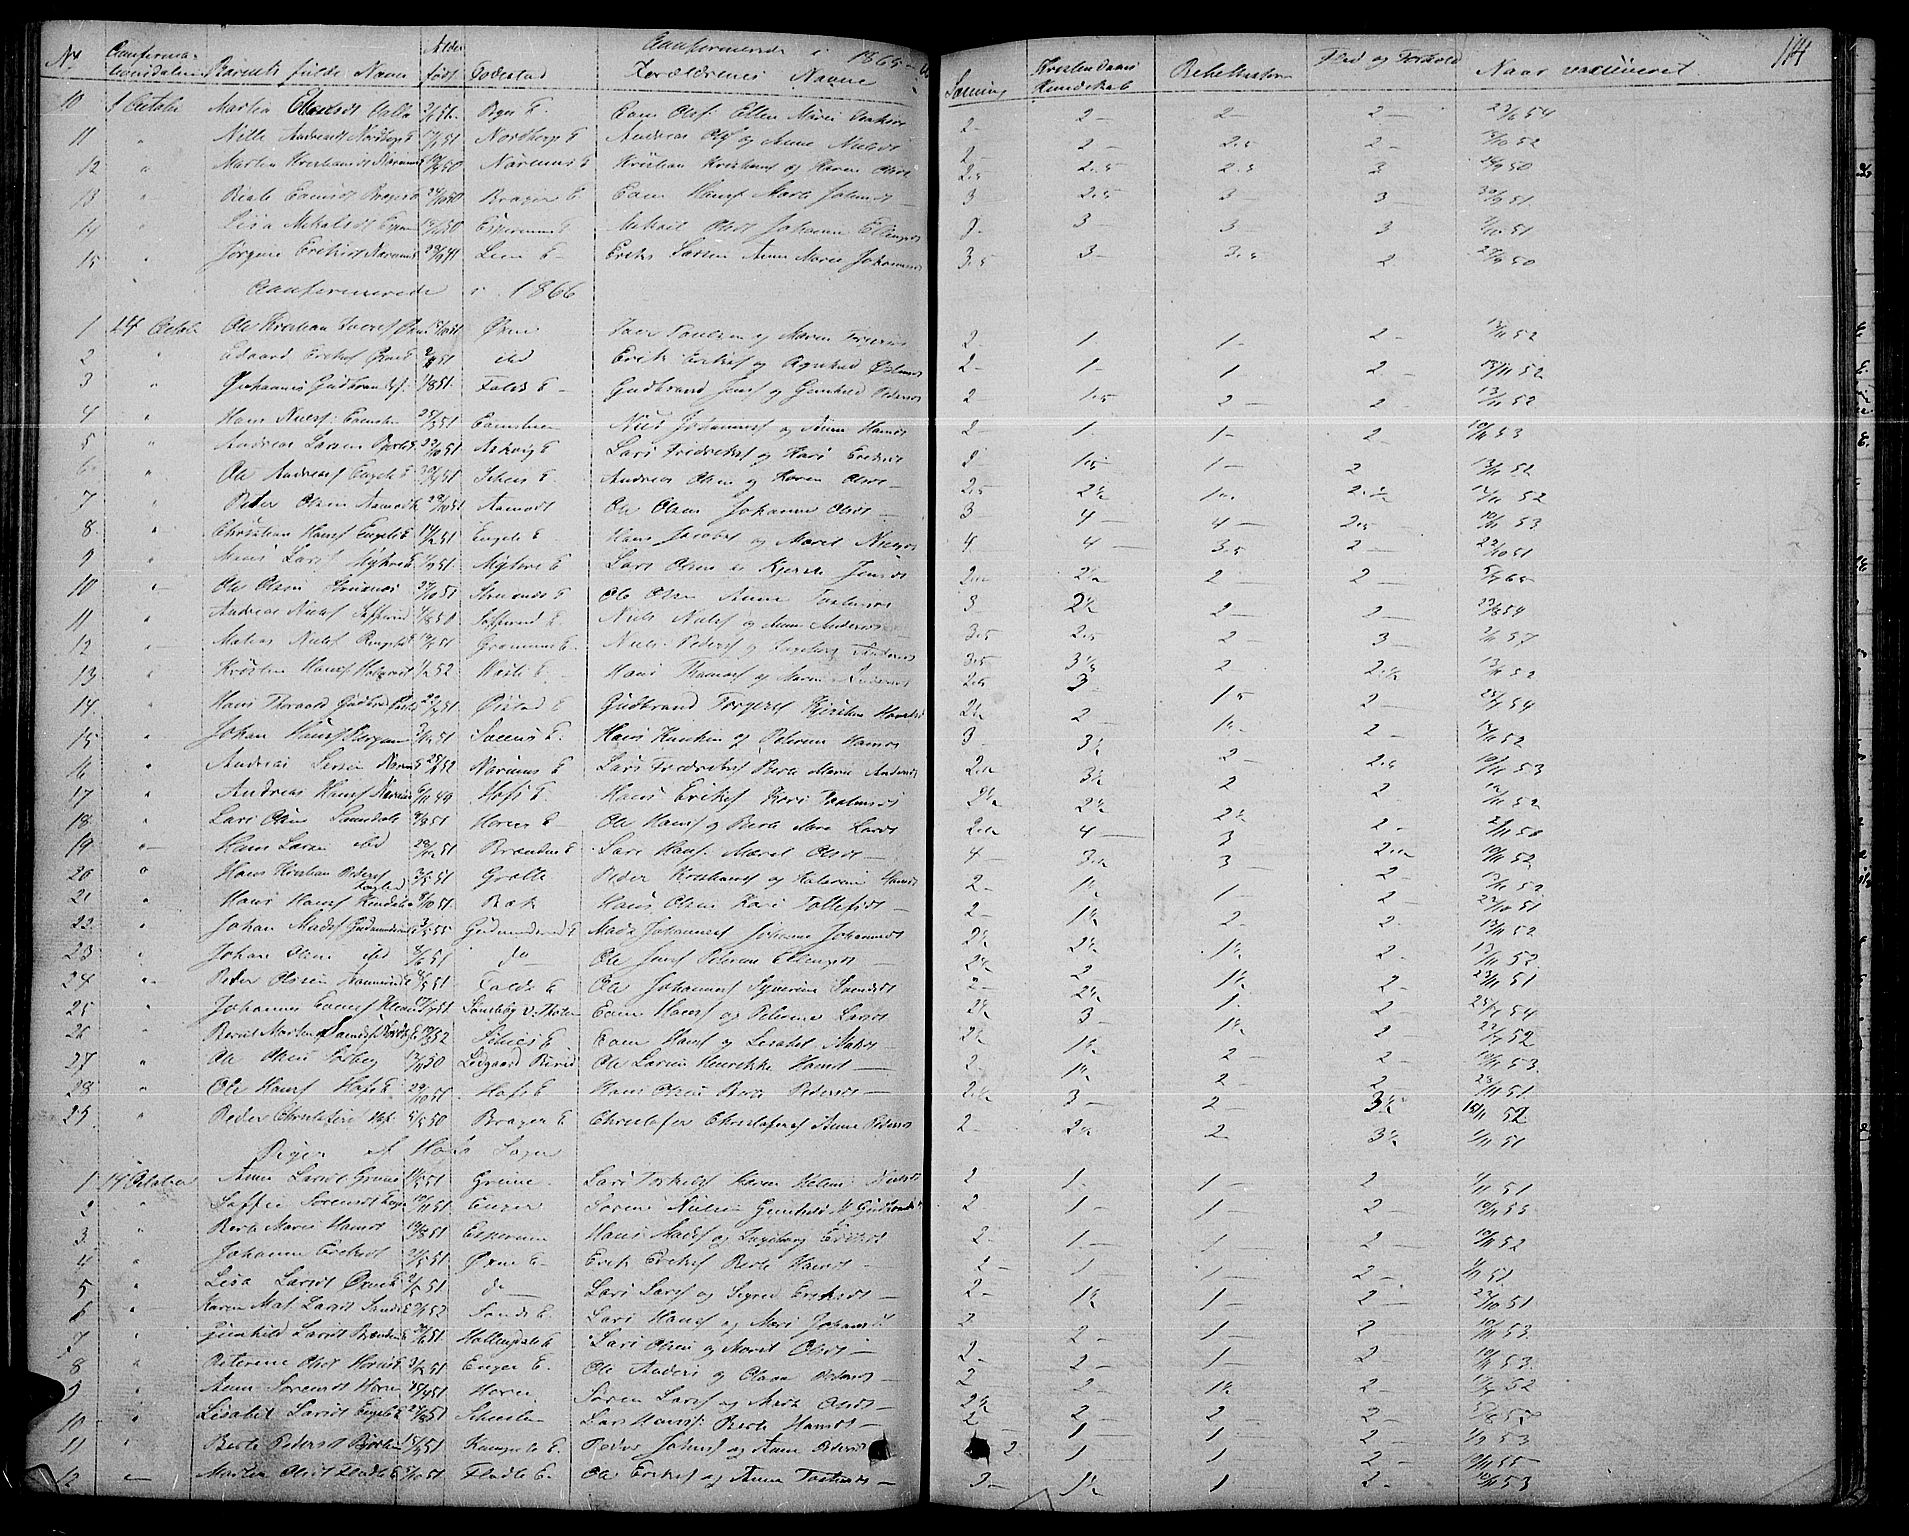 SAH, Søndre Land prestekontor, L/L0001: Klokkerbok nr. 1, 1849-1883, s. 114